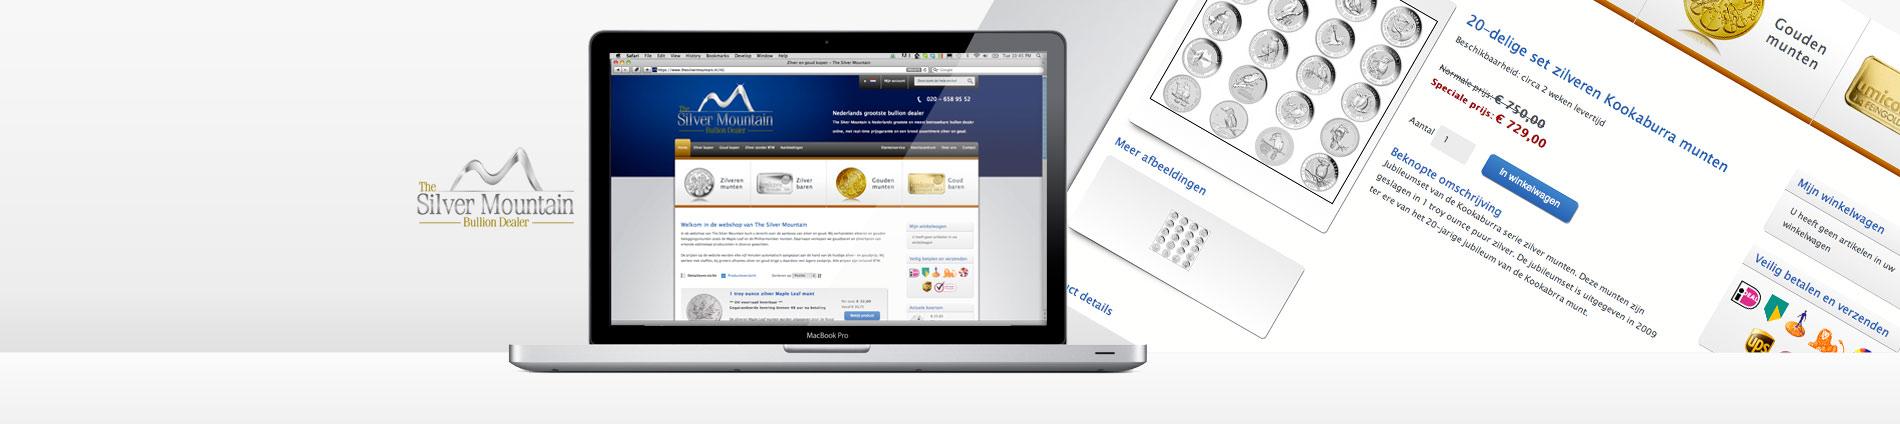 magento shop. magento webwinkel laten maken, shop bouwen